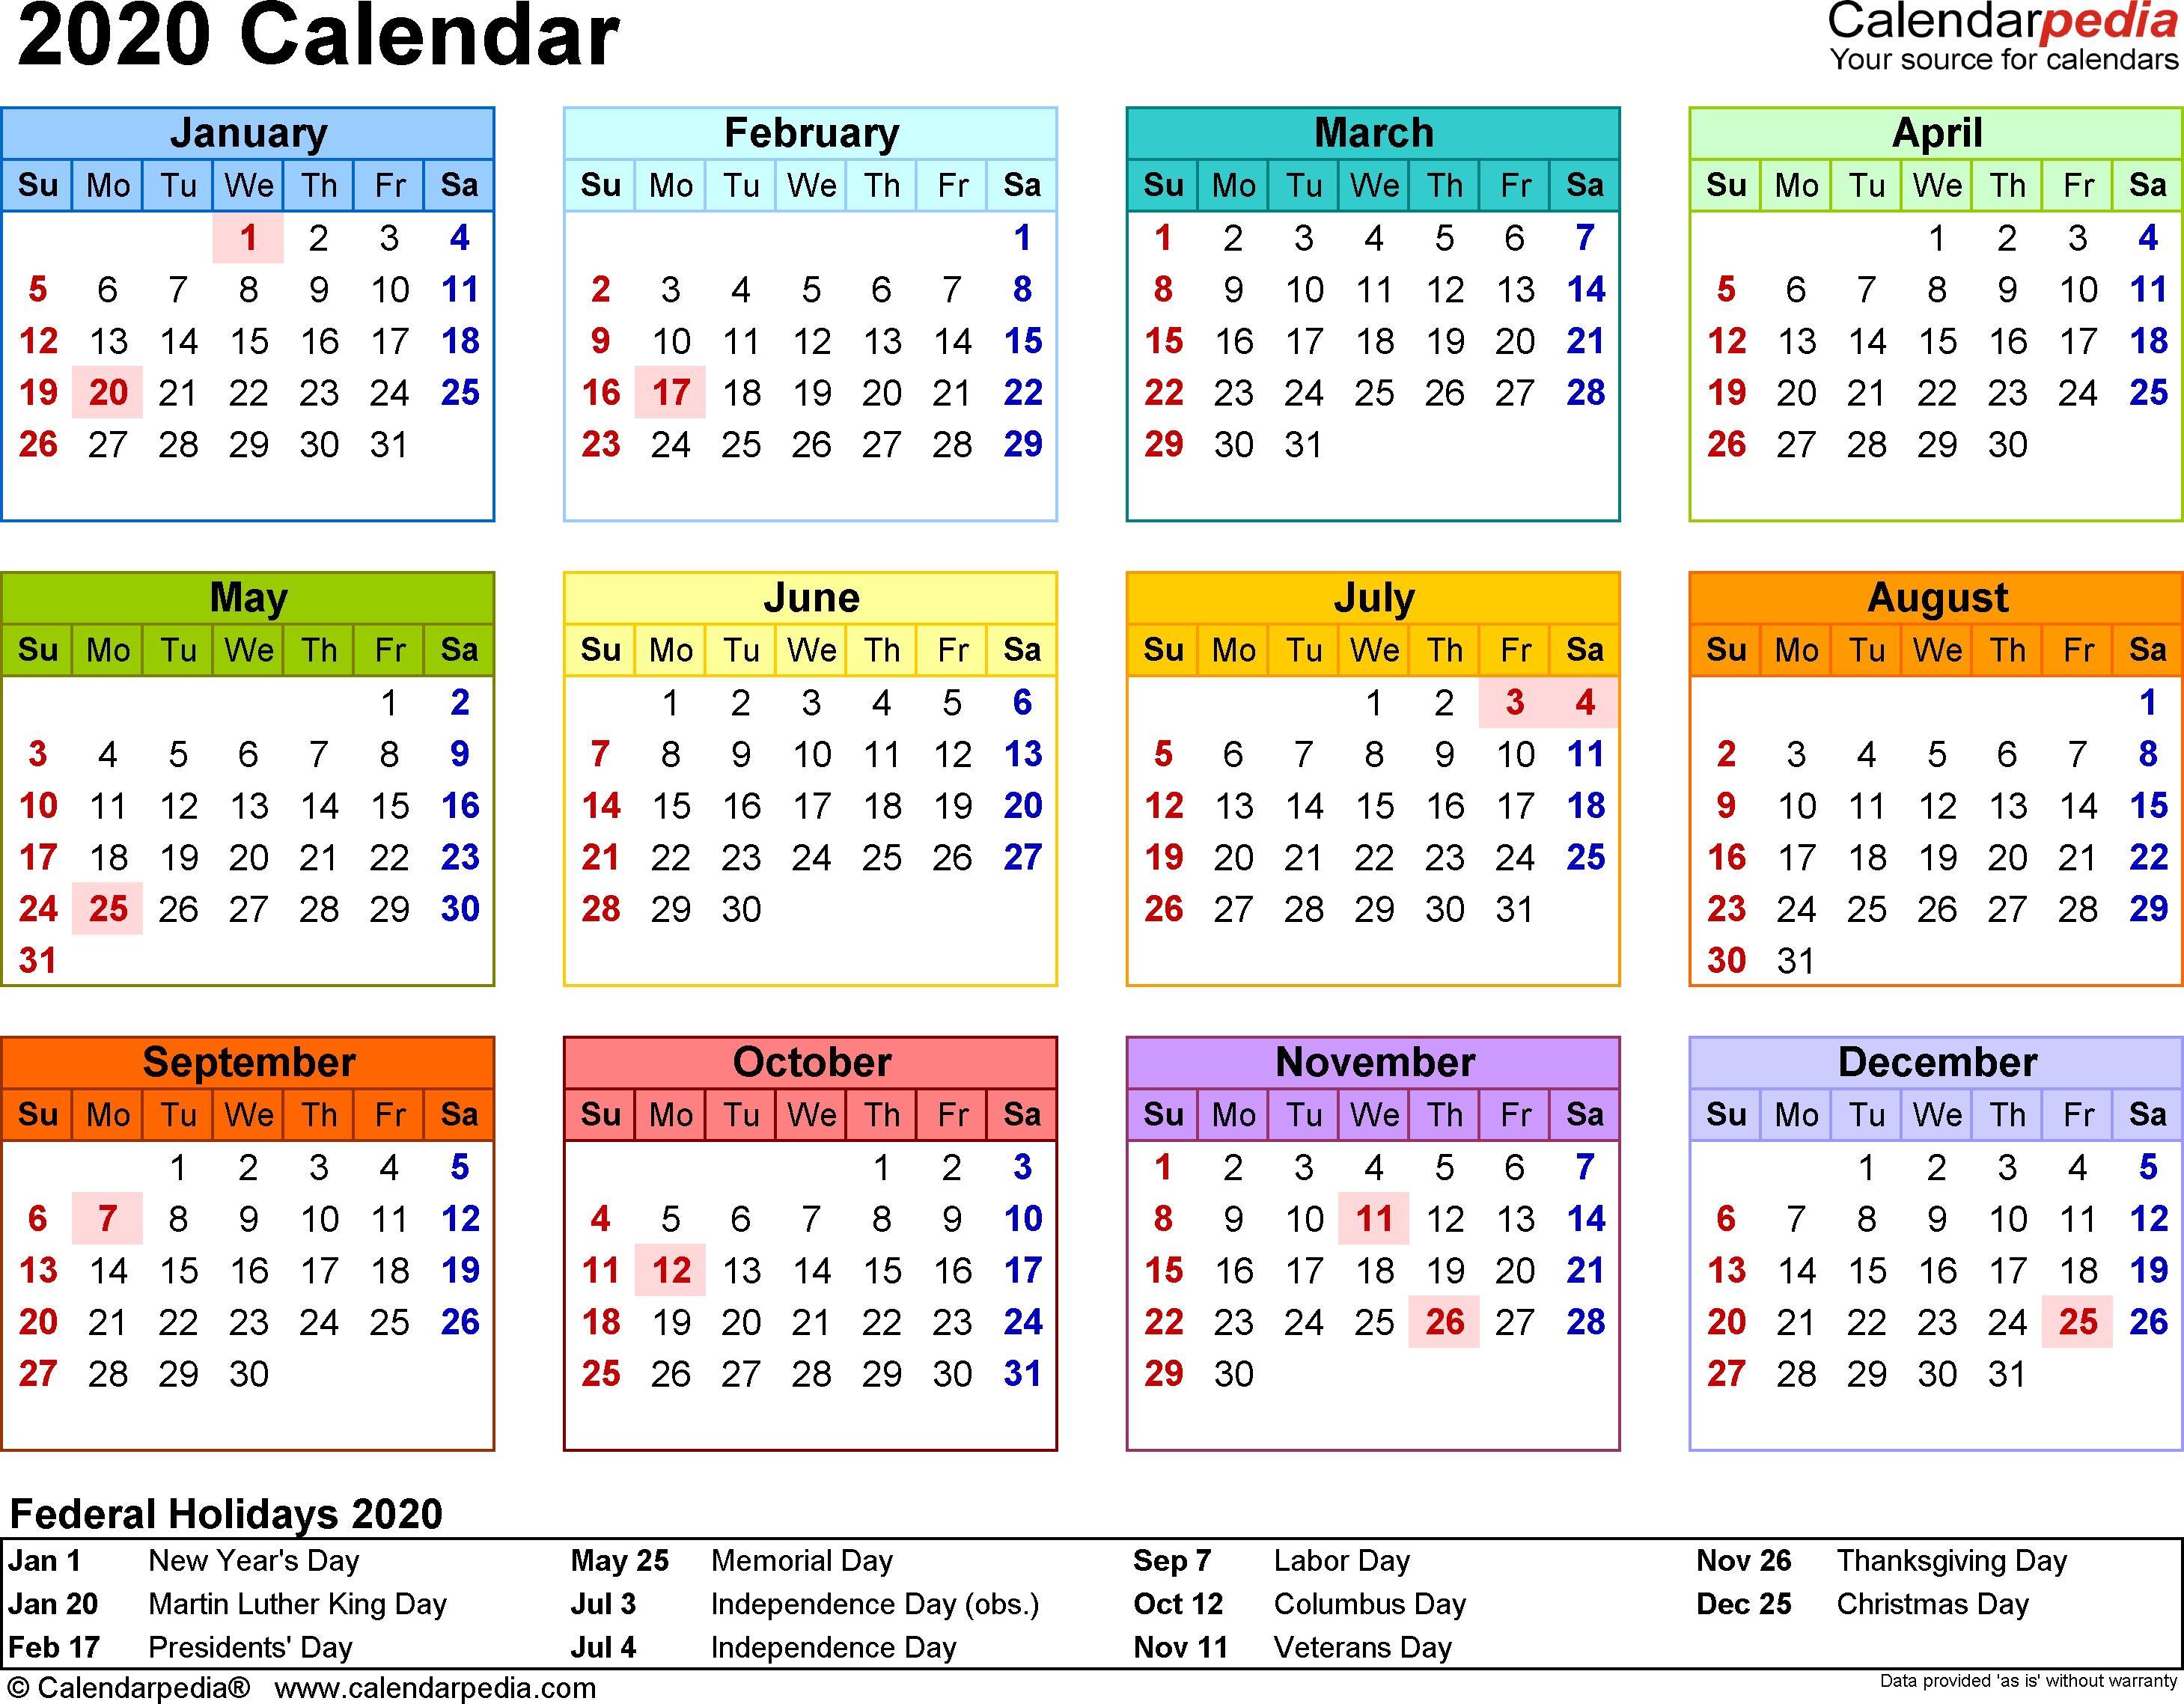 2020 Calendar Pdf - 17 Free Printable Calendar Templates pertaining to 2020 Printable Calendar Starting With Monday